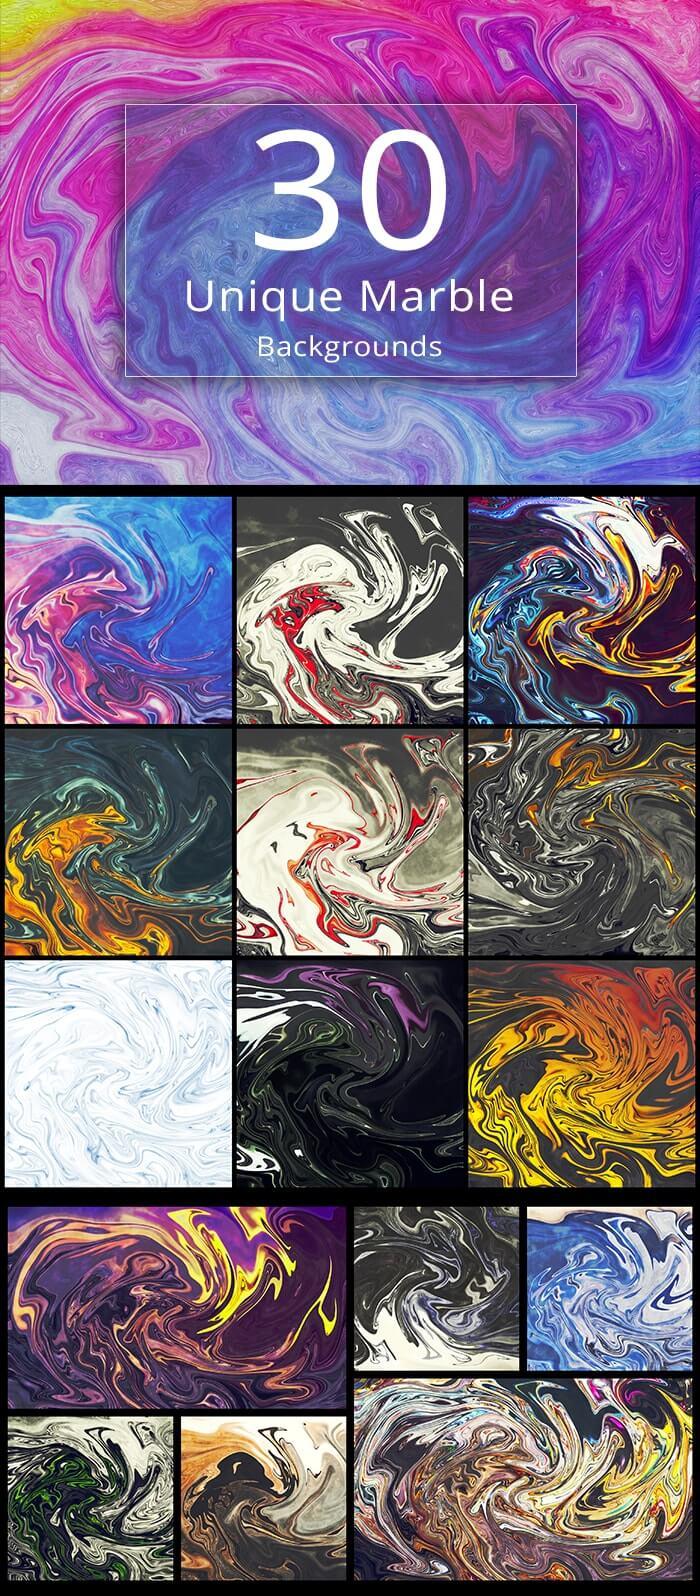 2000+ High Resolution Digital Backgrounds Bundle - $29 - 30 Unique Marble Backgrounds